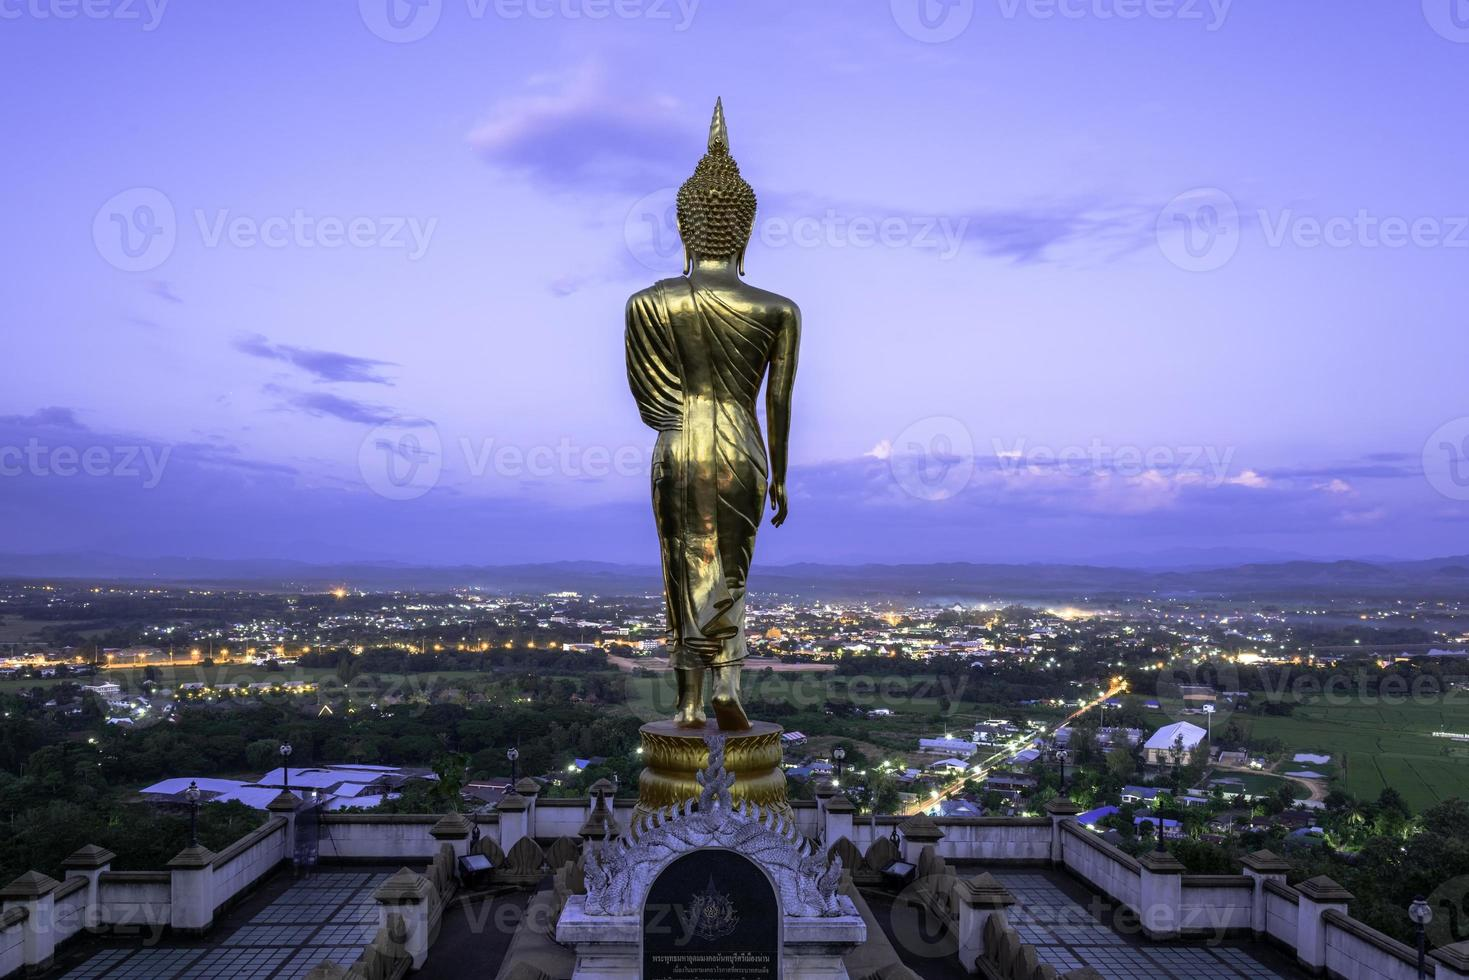 estátua de Buda de ouro no templo khao noi, província de nan, Tailândia foto